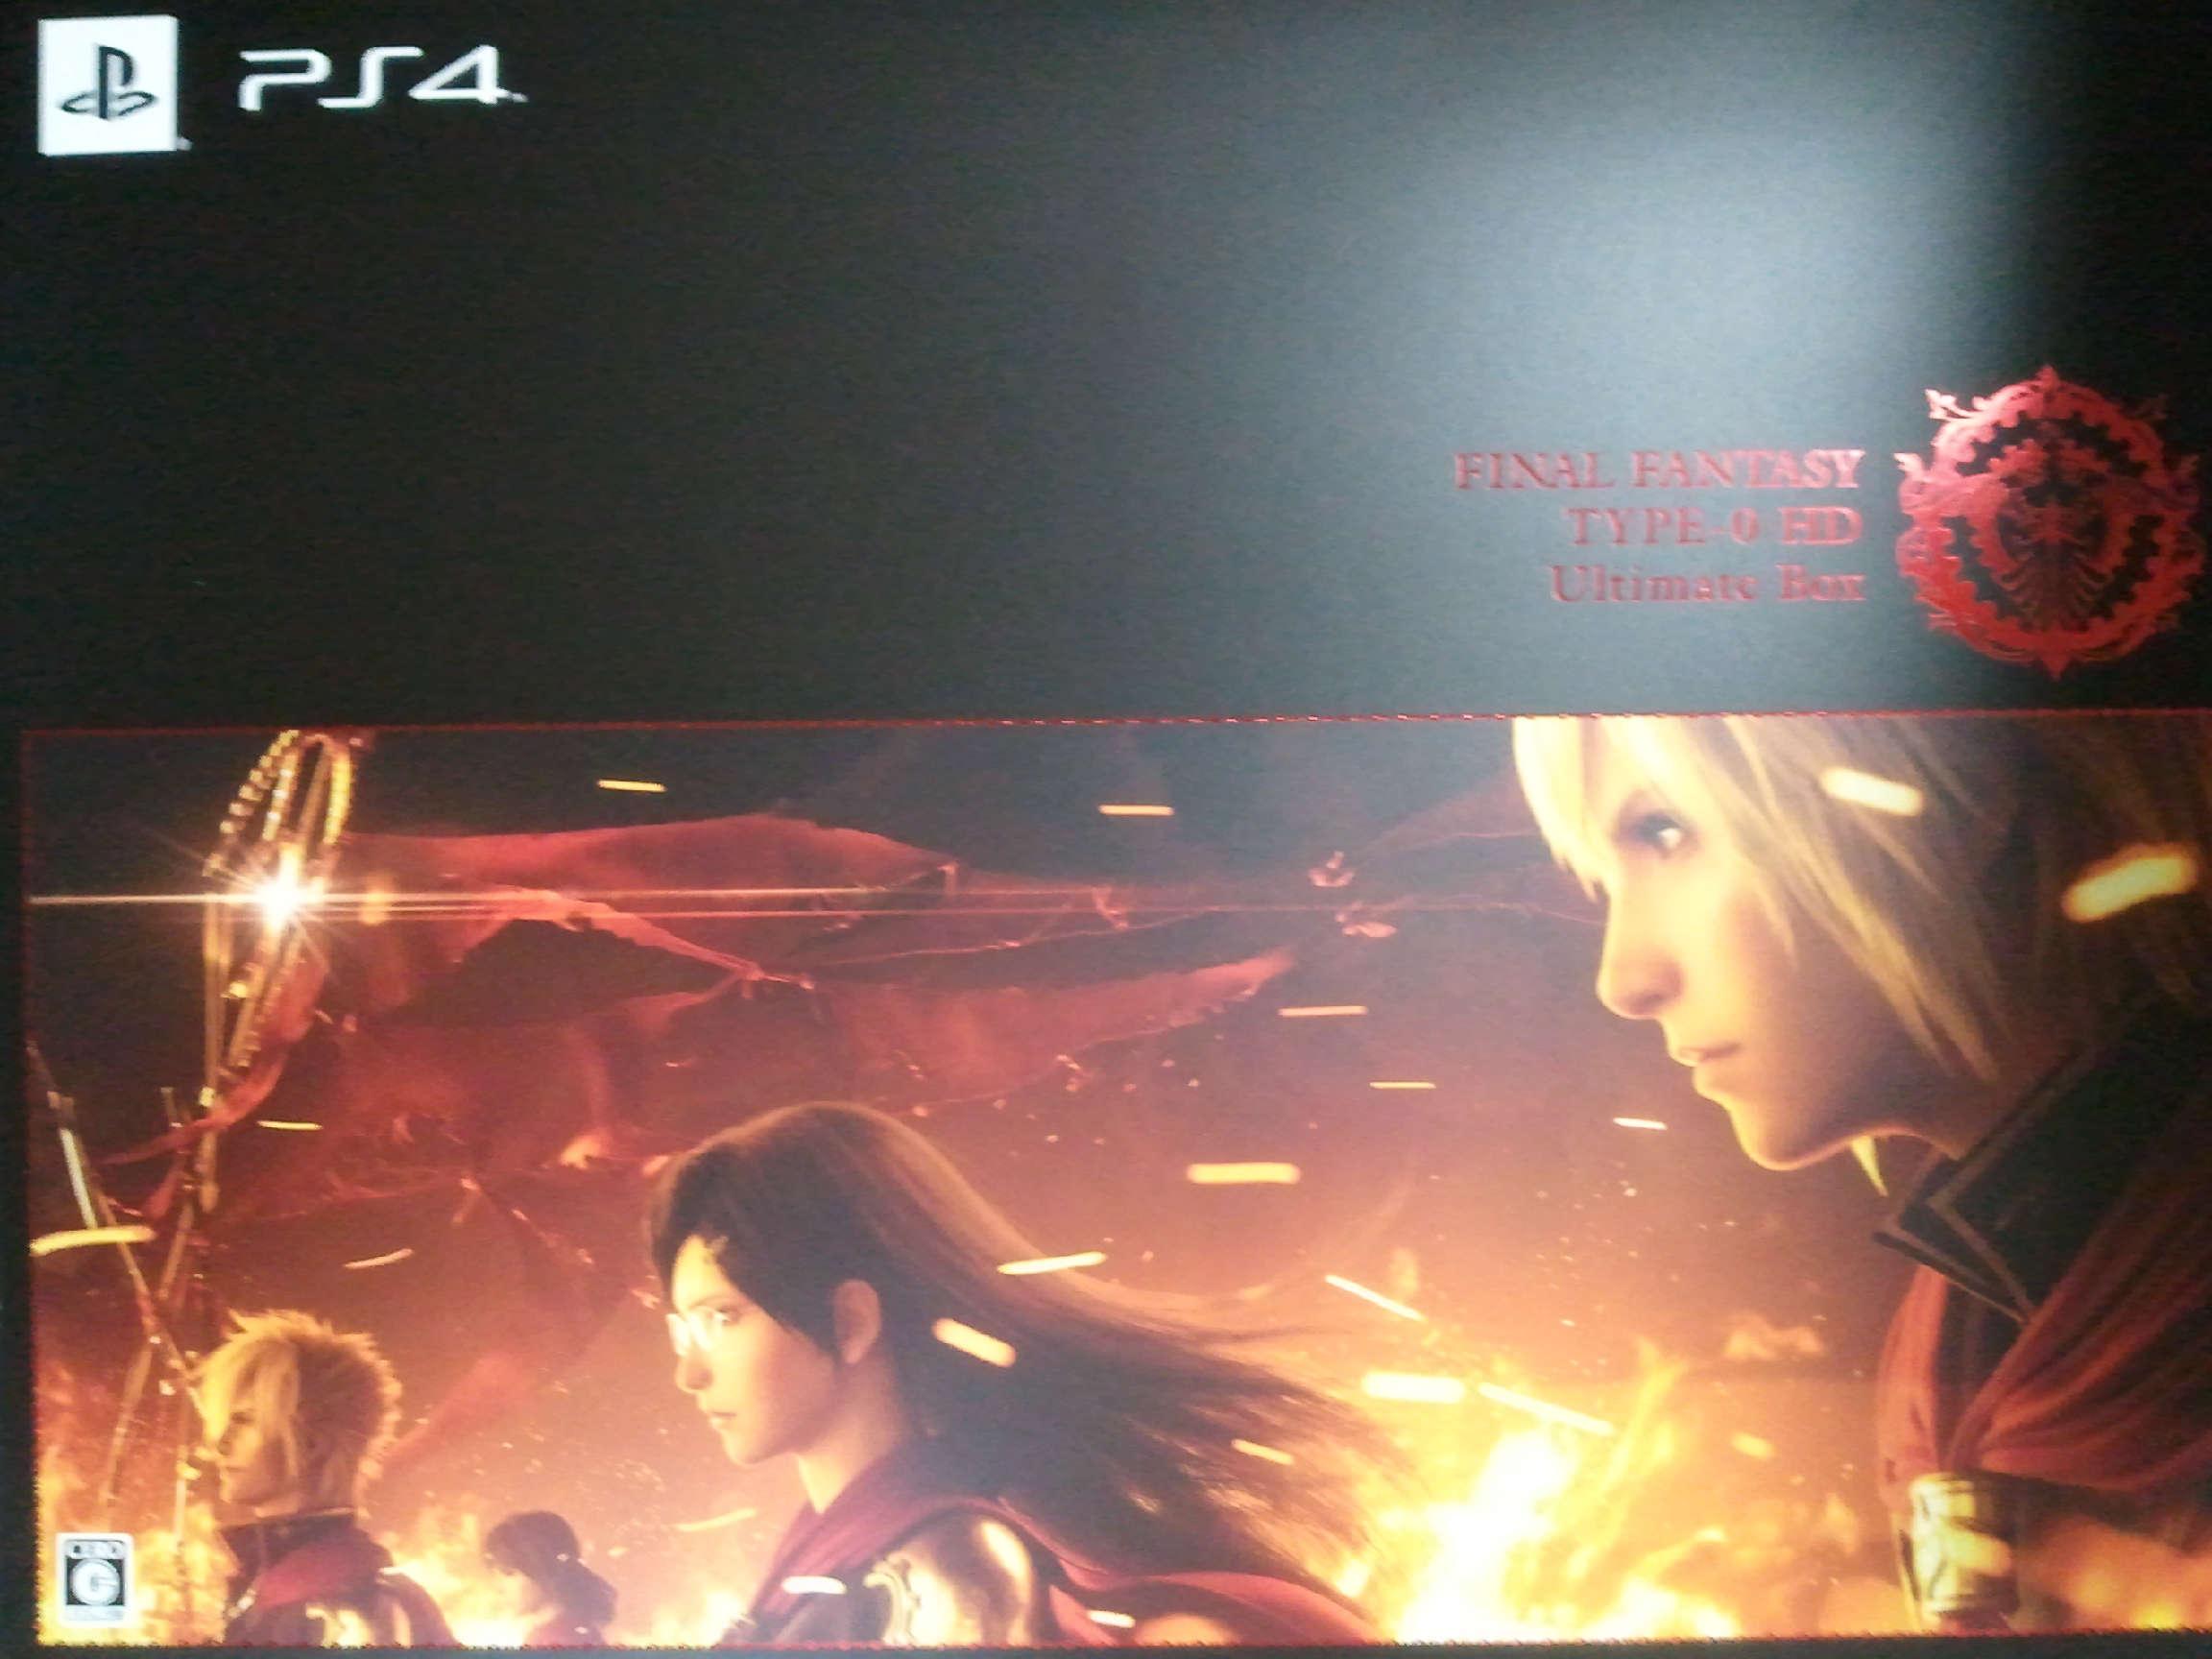 FINAL FANTASY 零式 HD Ultimate Box